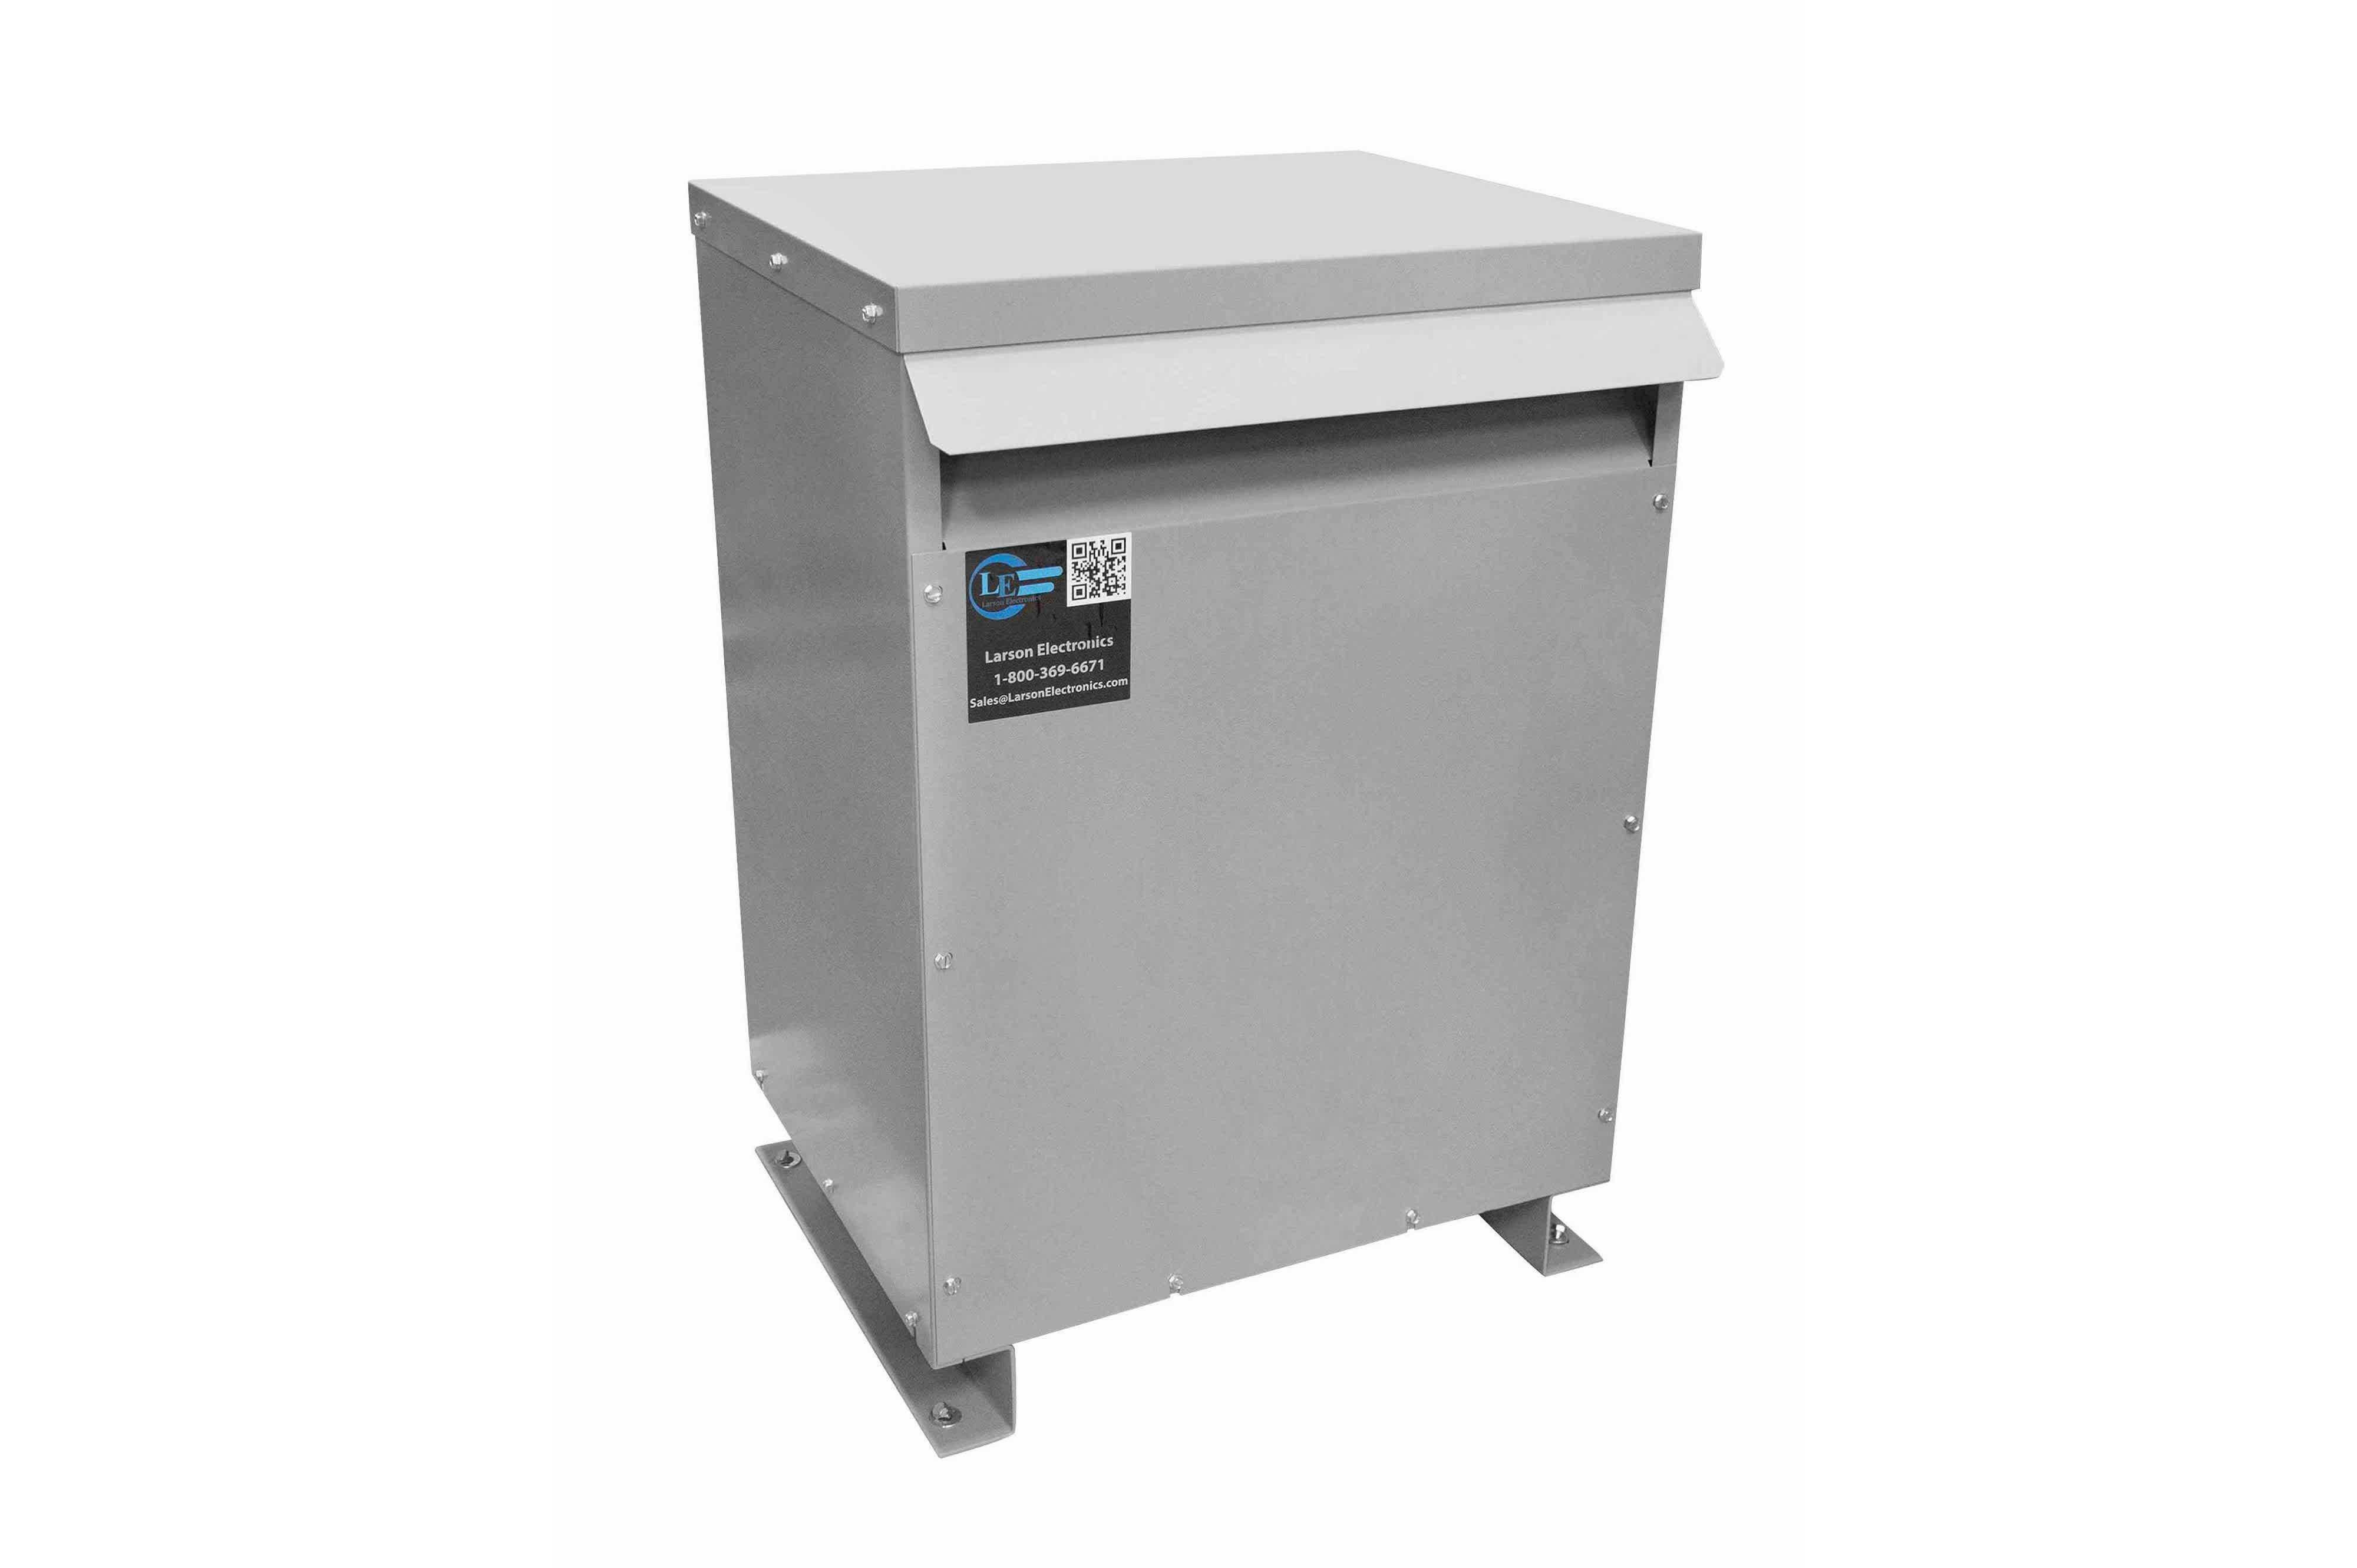 42.5 kVA 3PH Isolation Transformer, 575V Wye Primary, 480Y/277 Wye-N Secondary, N3R, Ventilated, 60 Hz